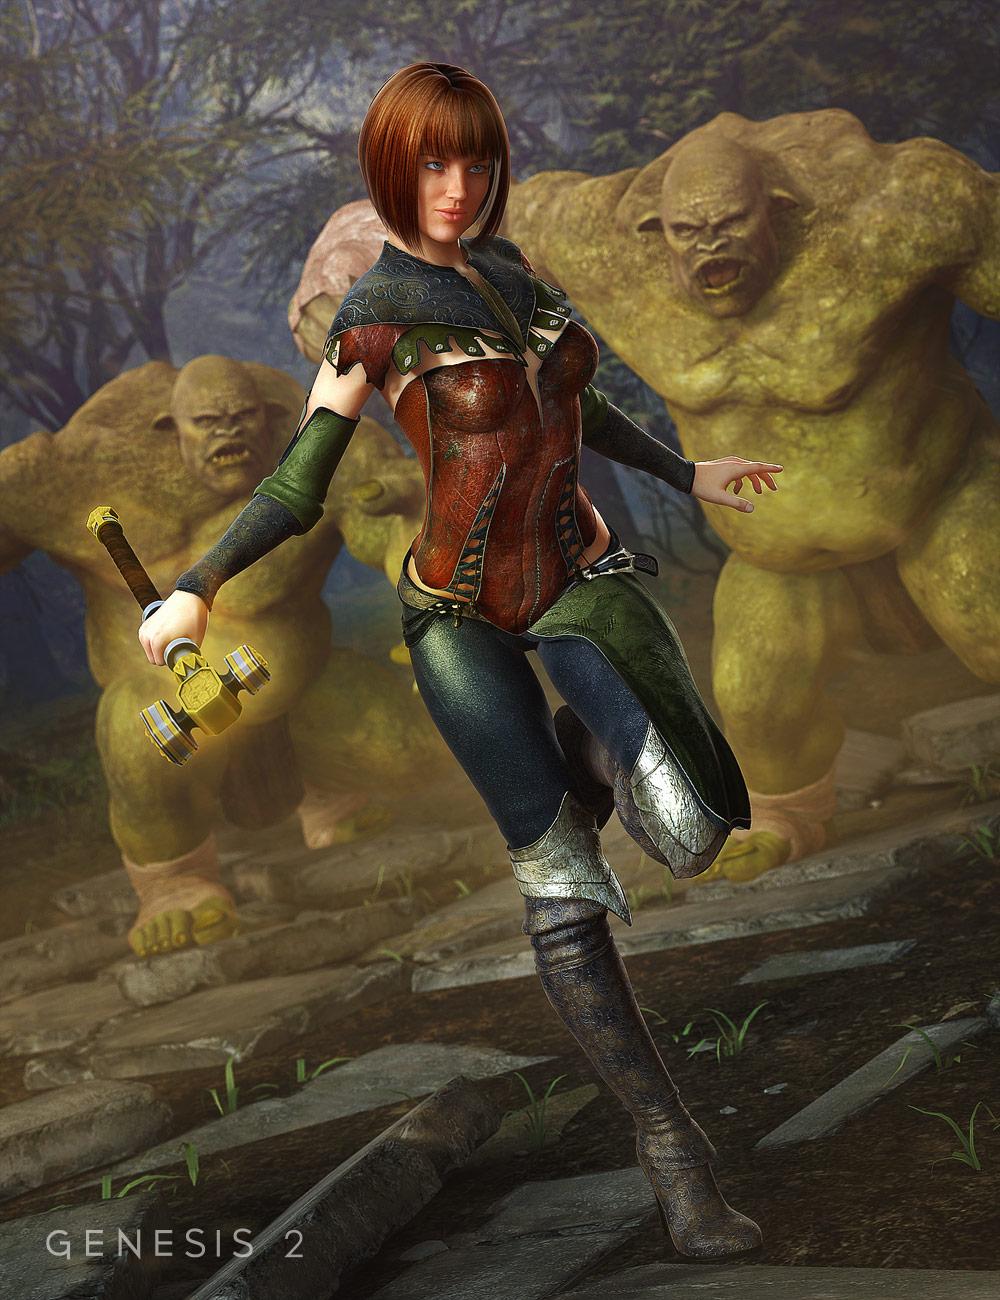 Darkwoods Heroine by: Barbara BrundonSarsa, 3D Models by Daz 3D